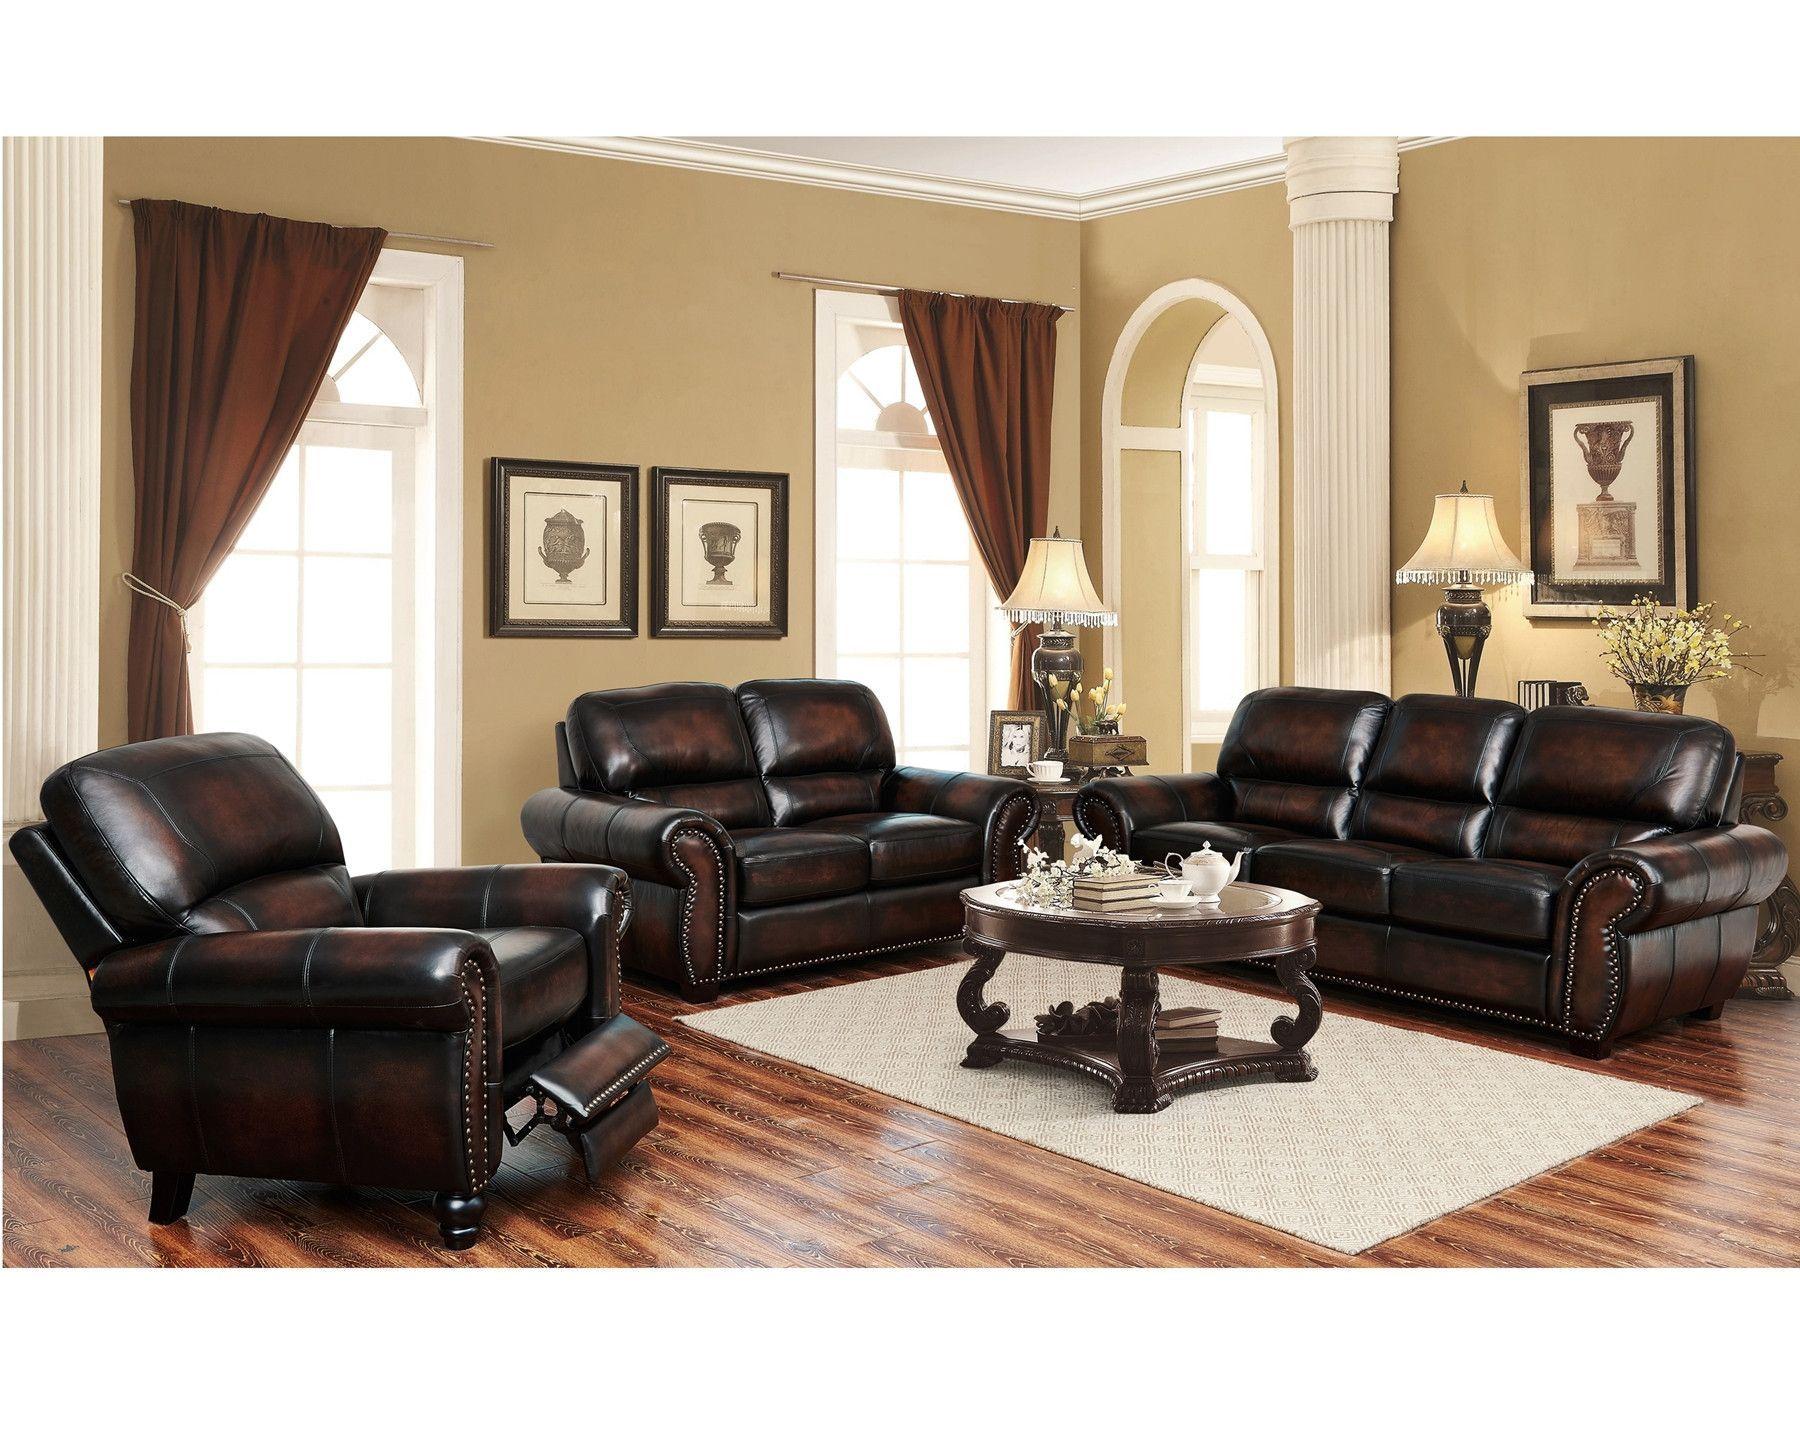 Top Grain Genuine Leather- The El Dorado Living Room Set